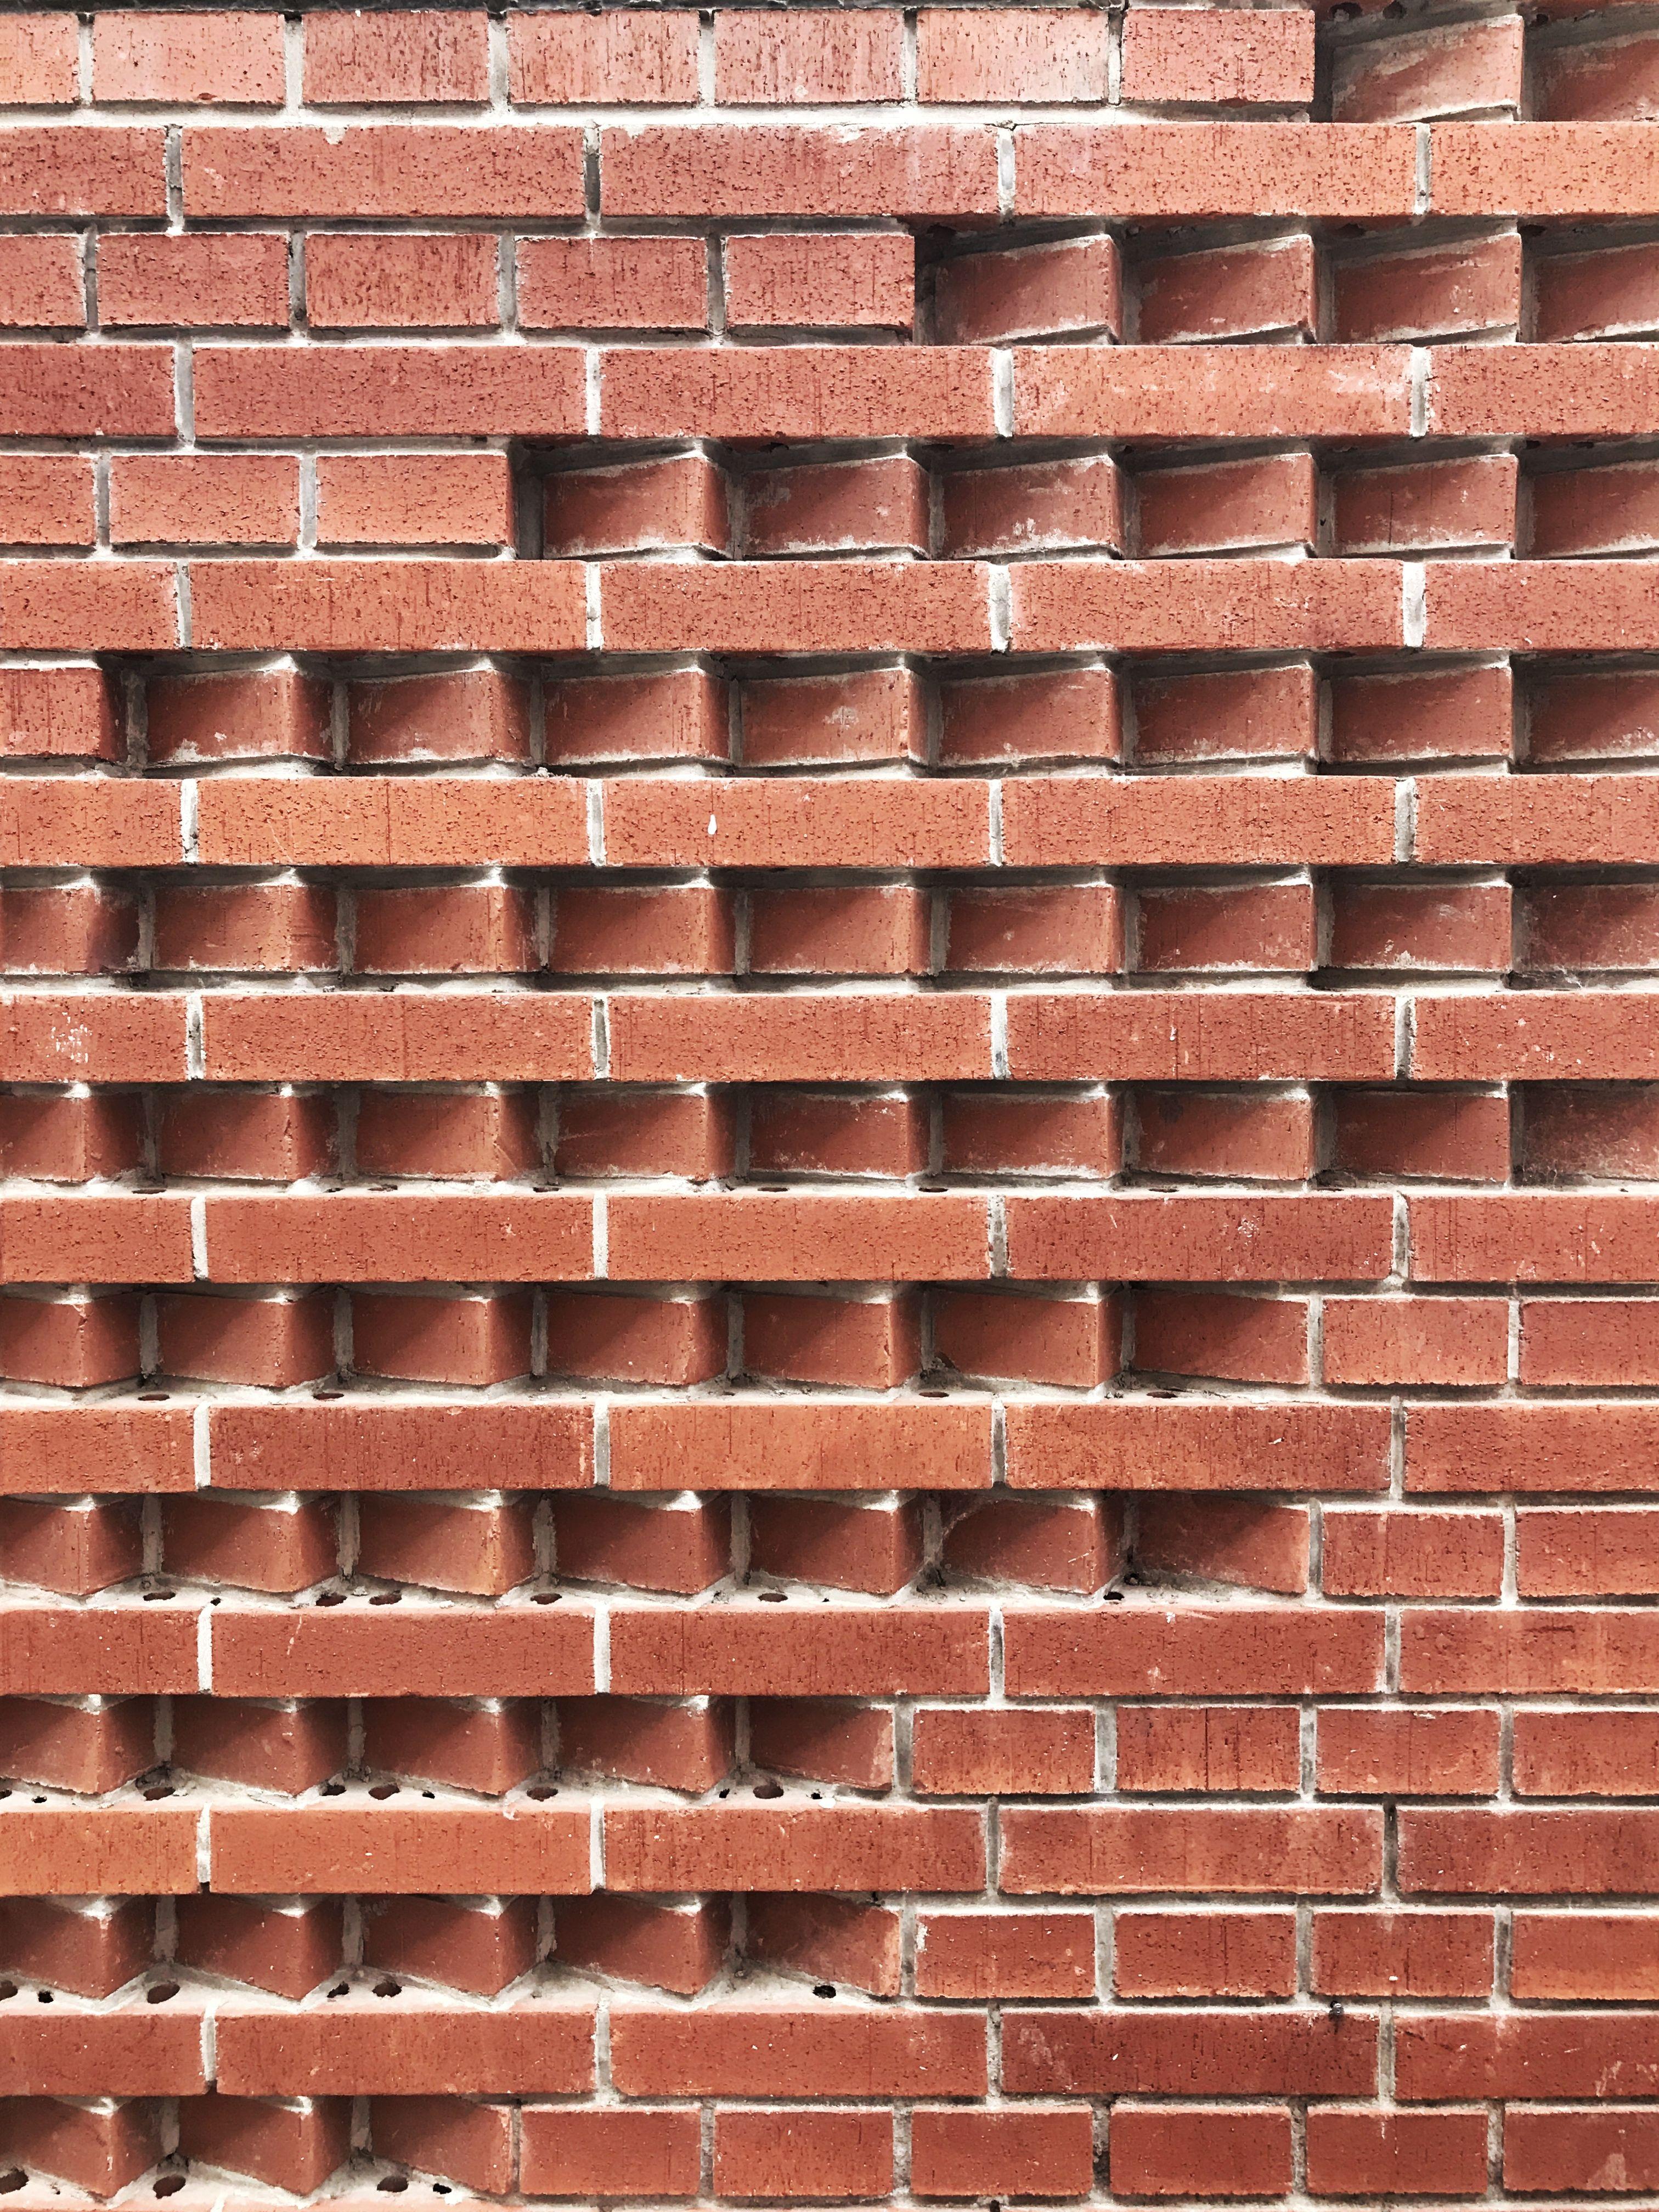 Brick Wall Brick Texture Brick Masonry Brick Cladding